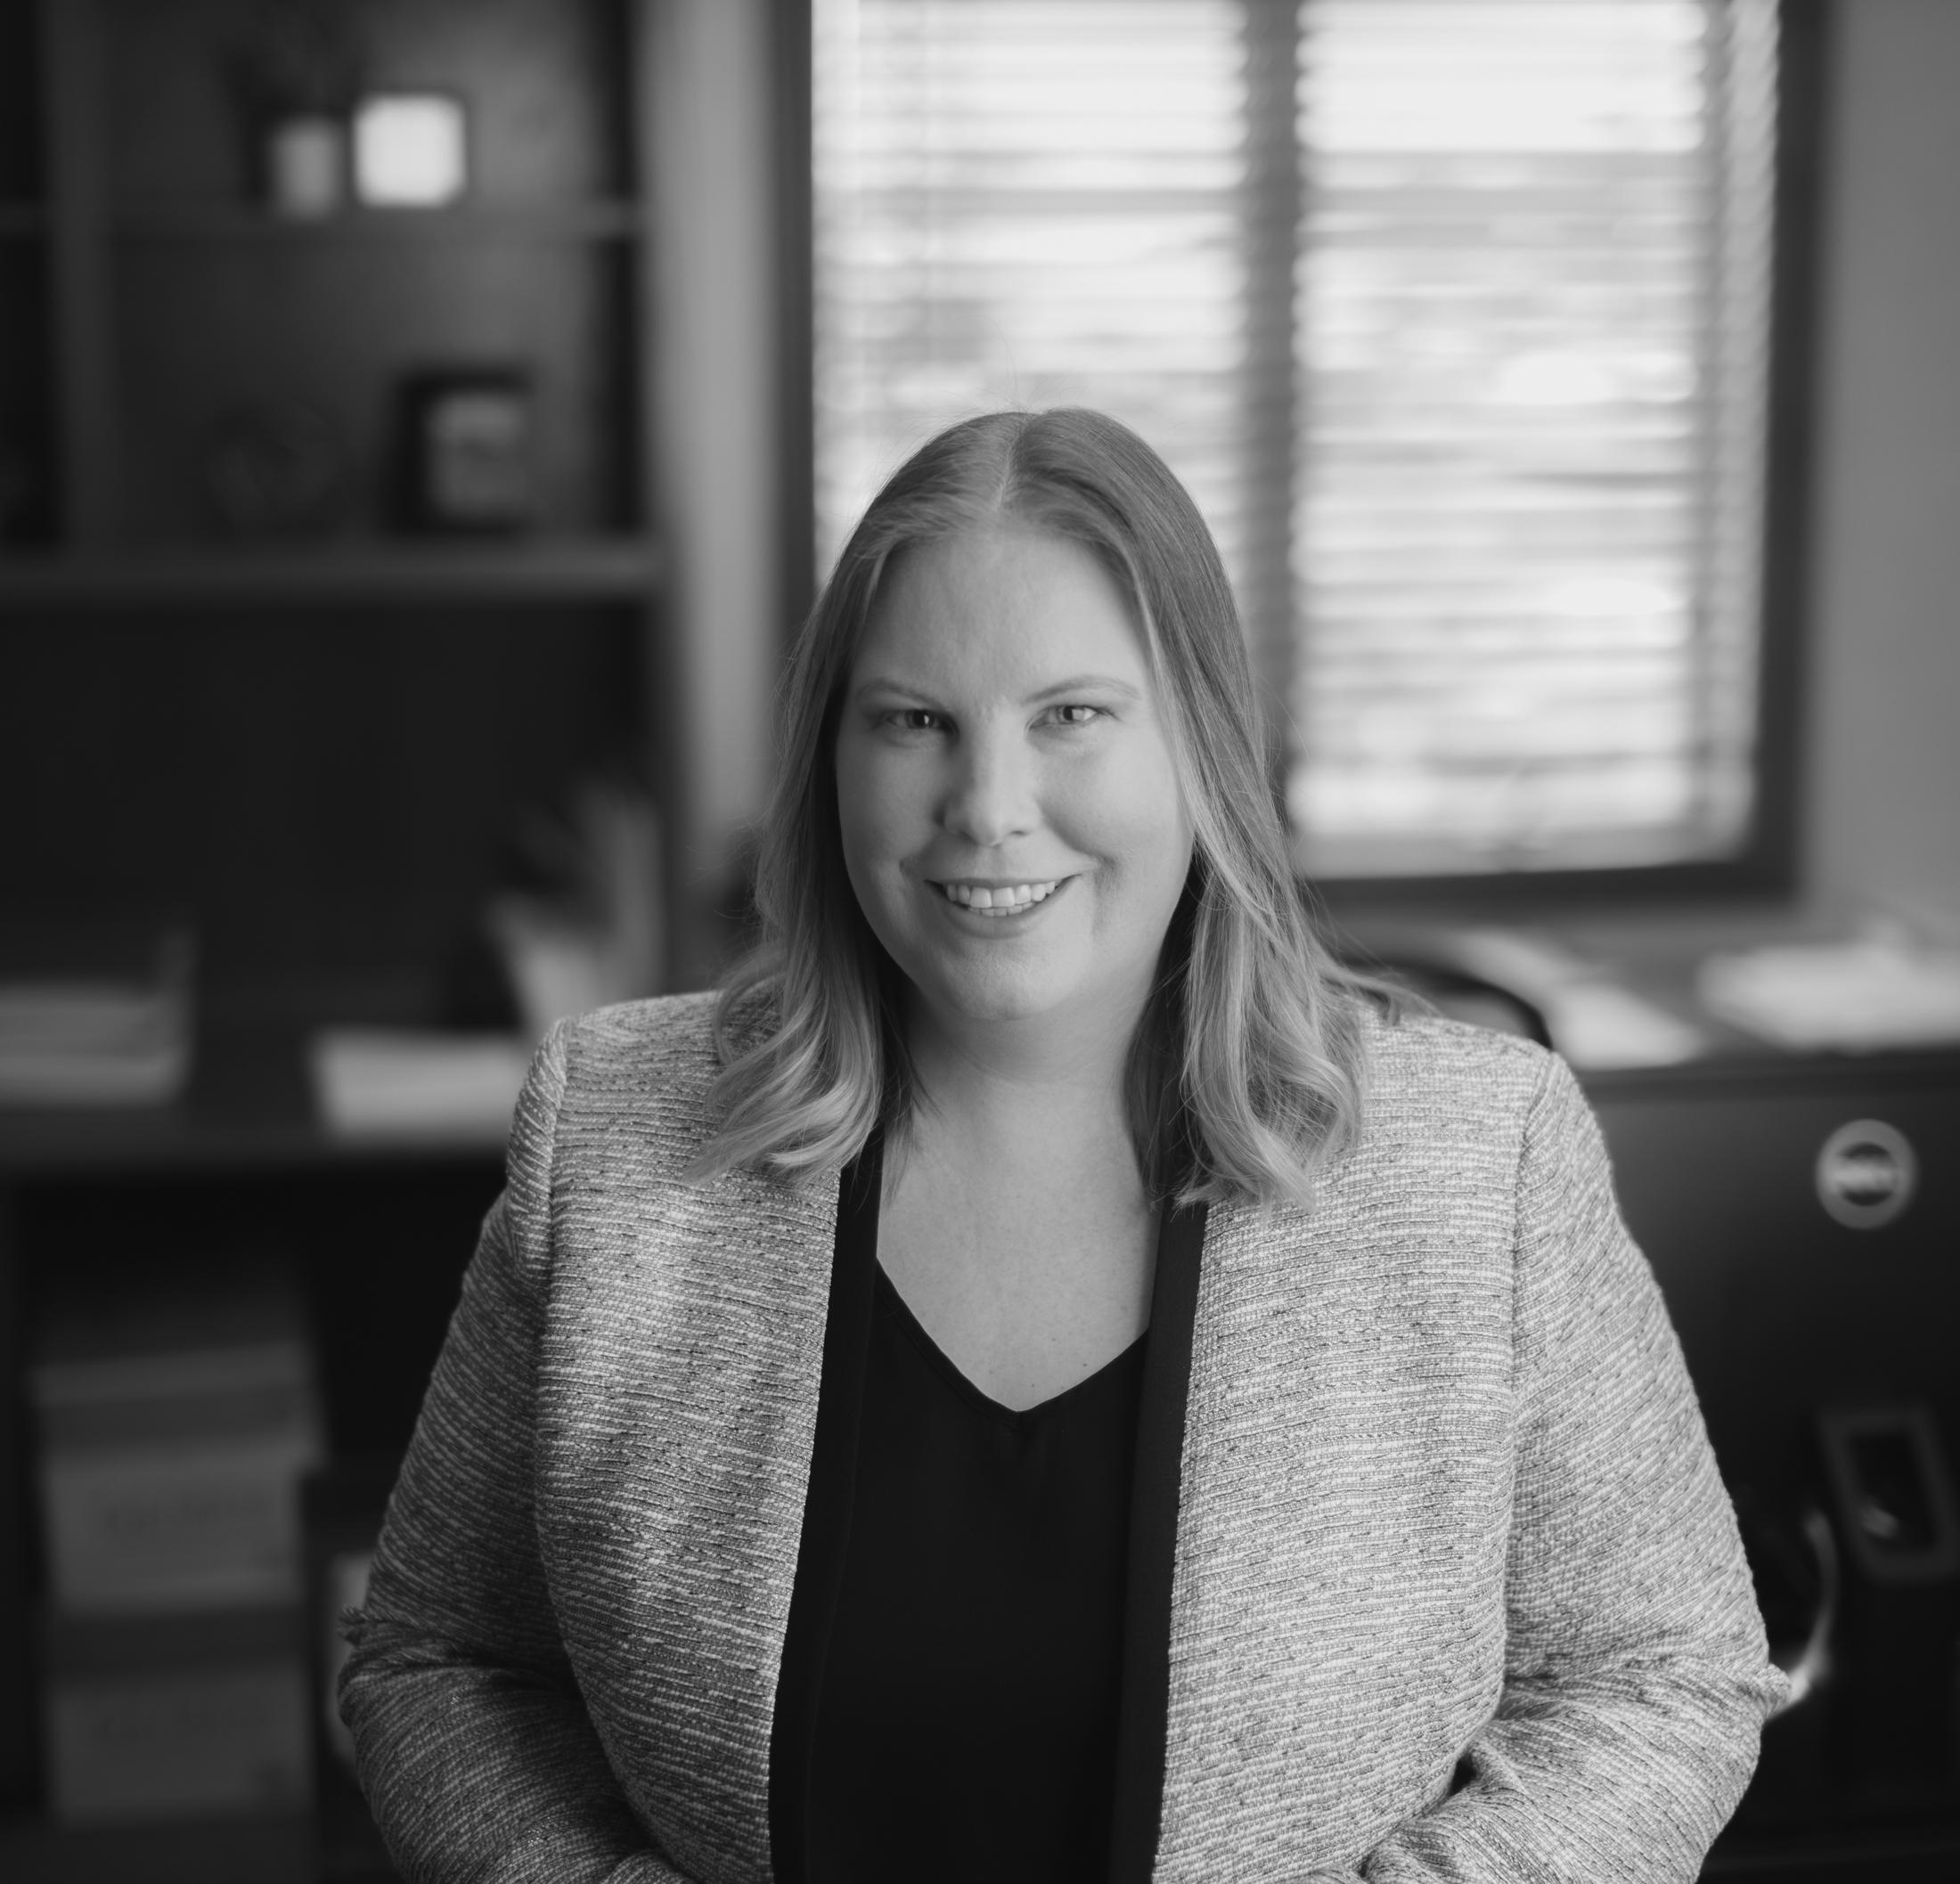 Allison Cross, Staff Accountant - Lawrence, Schluterman & Schwartz, LTD.